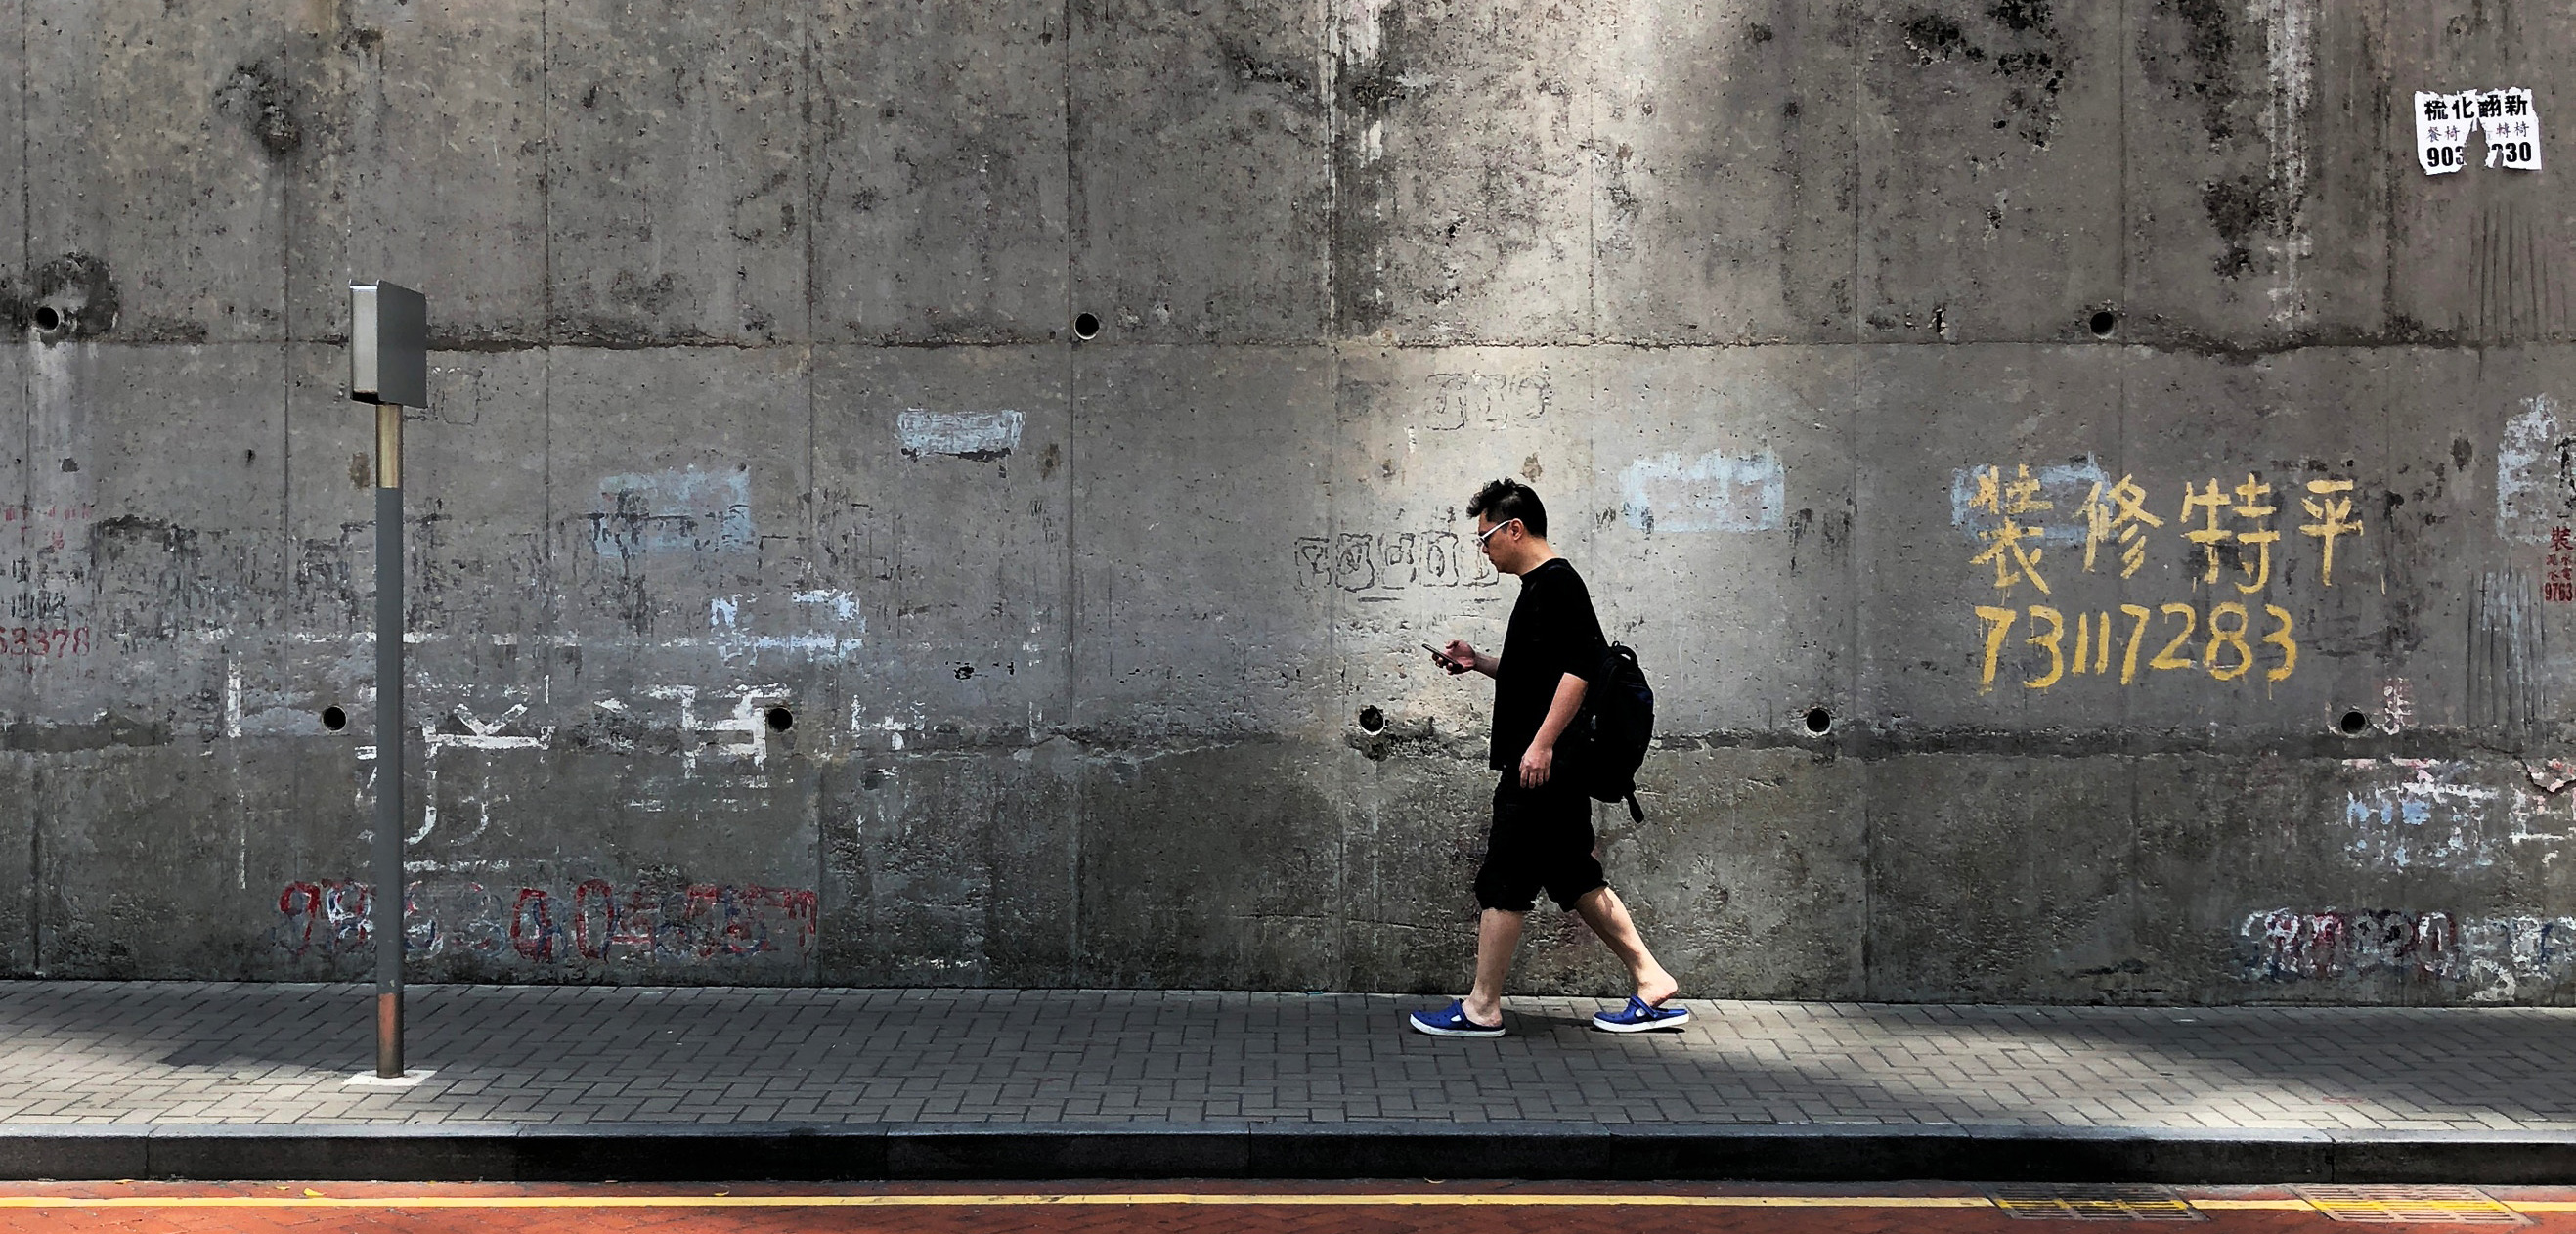 man walking whilst using his phone